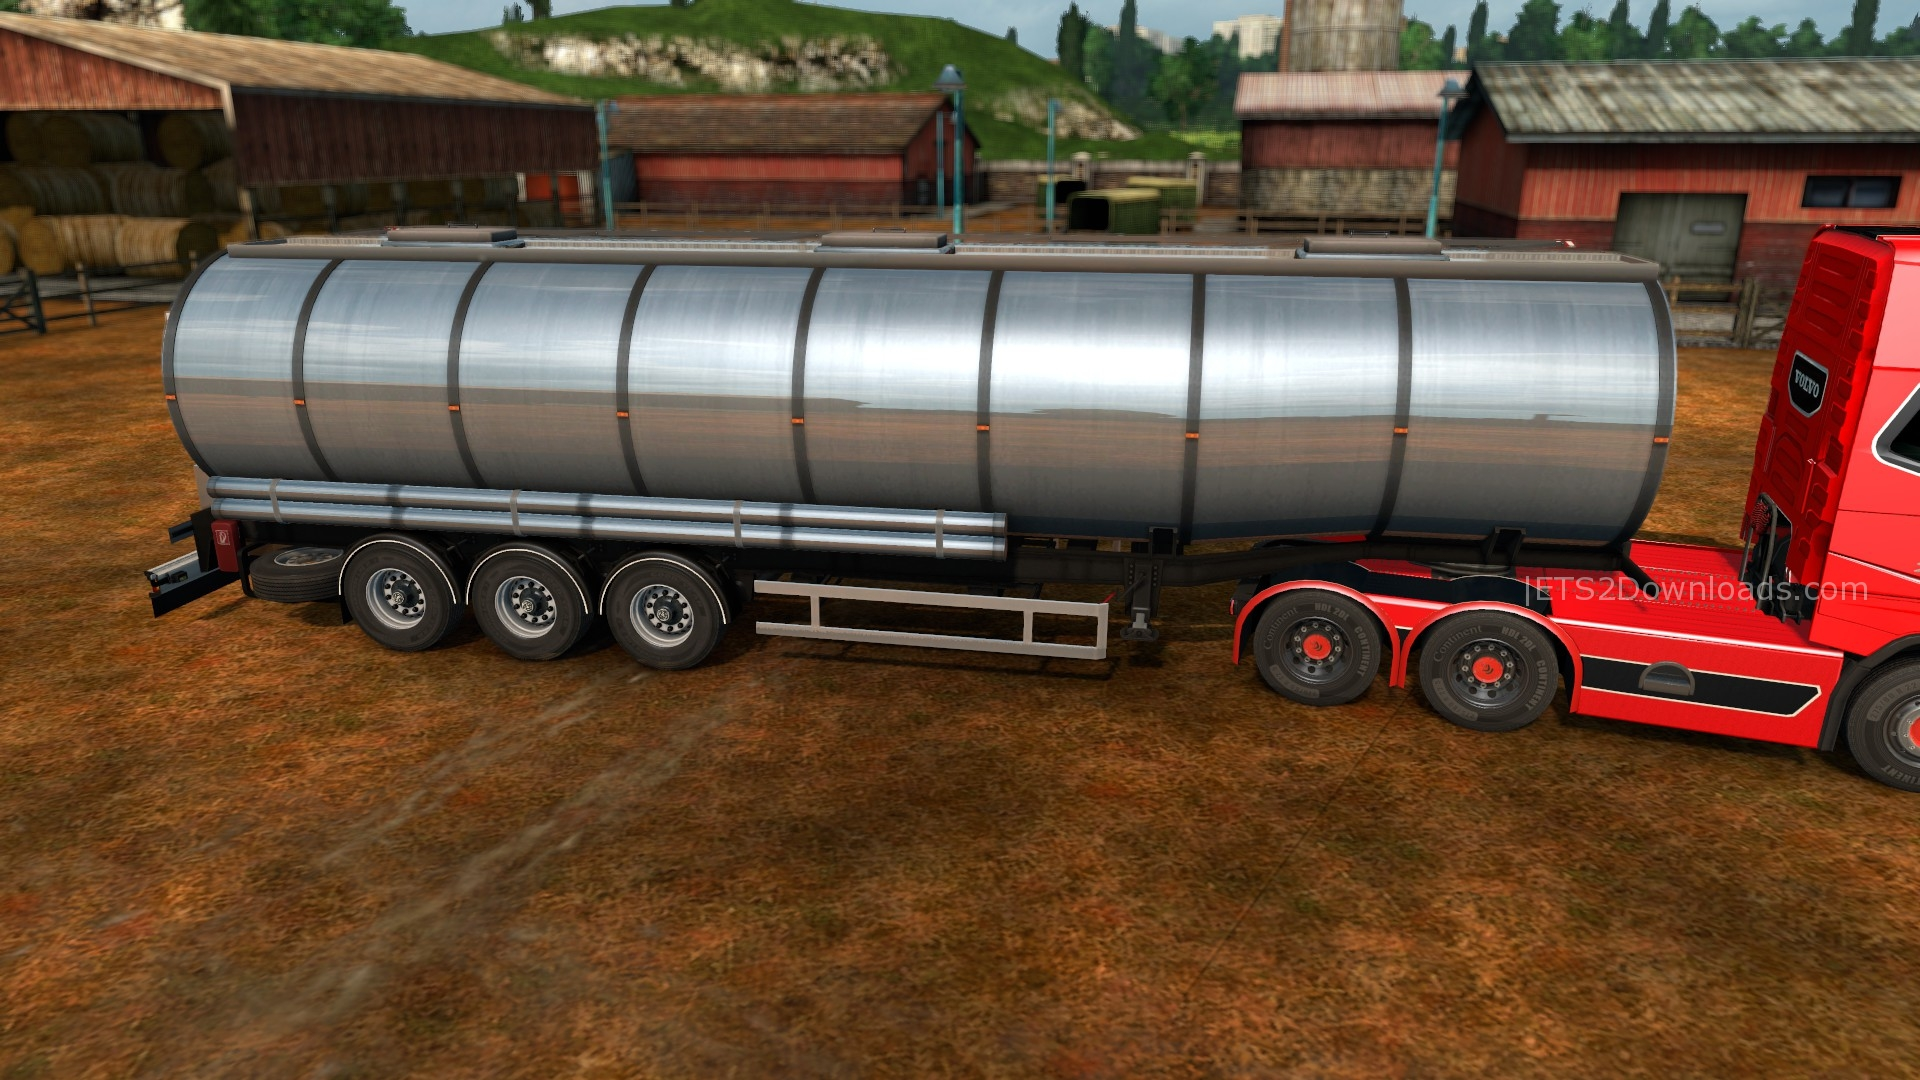 new-van-hool-trailer-2